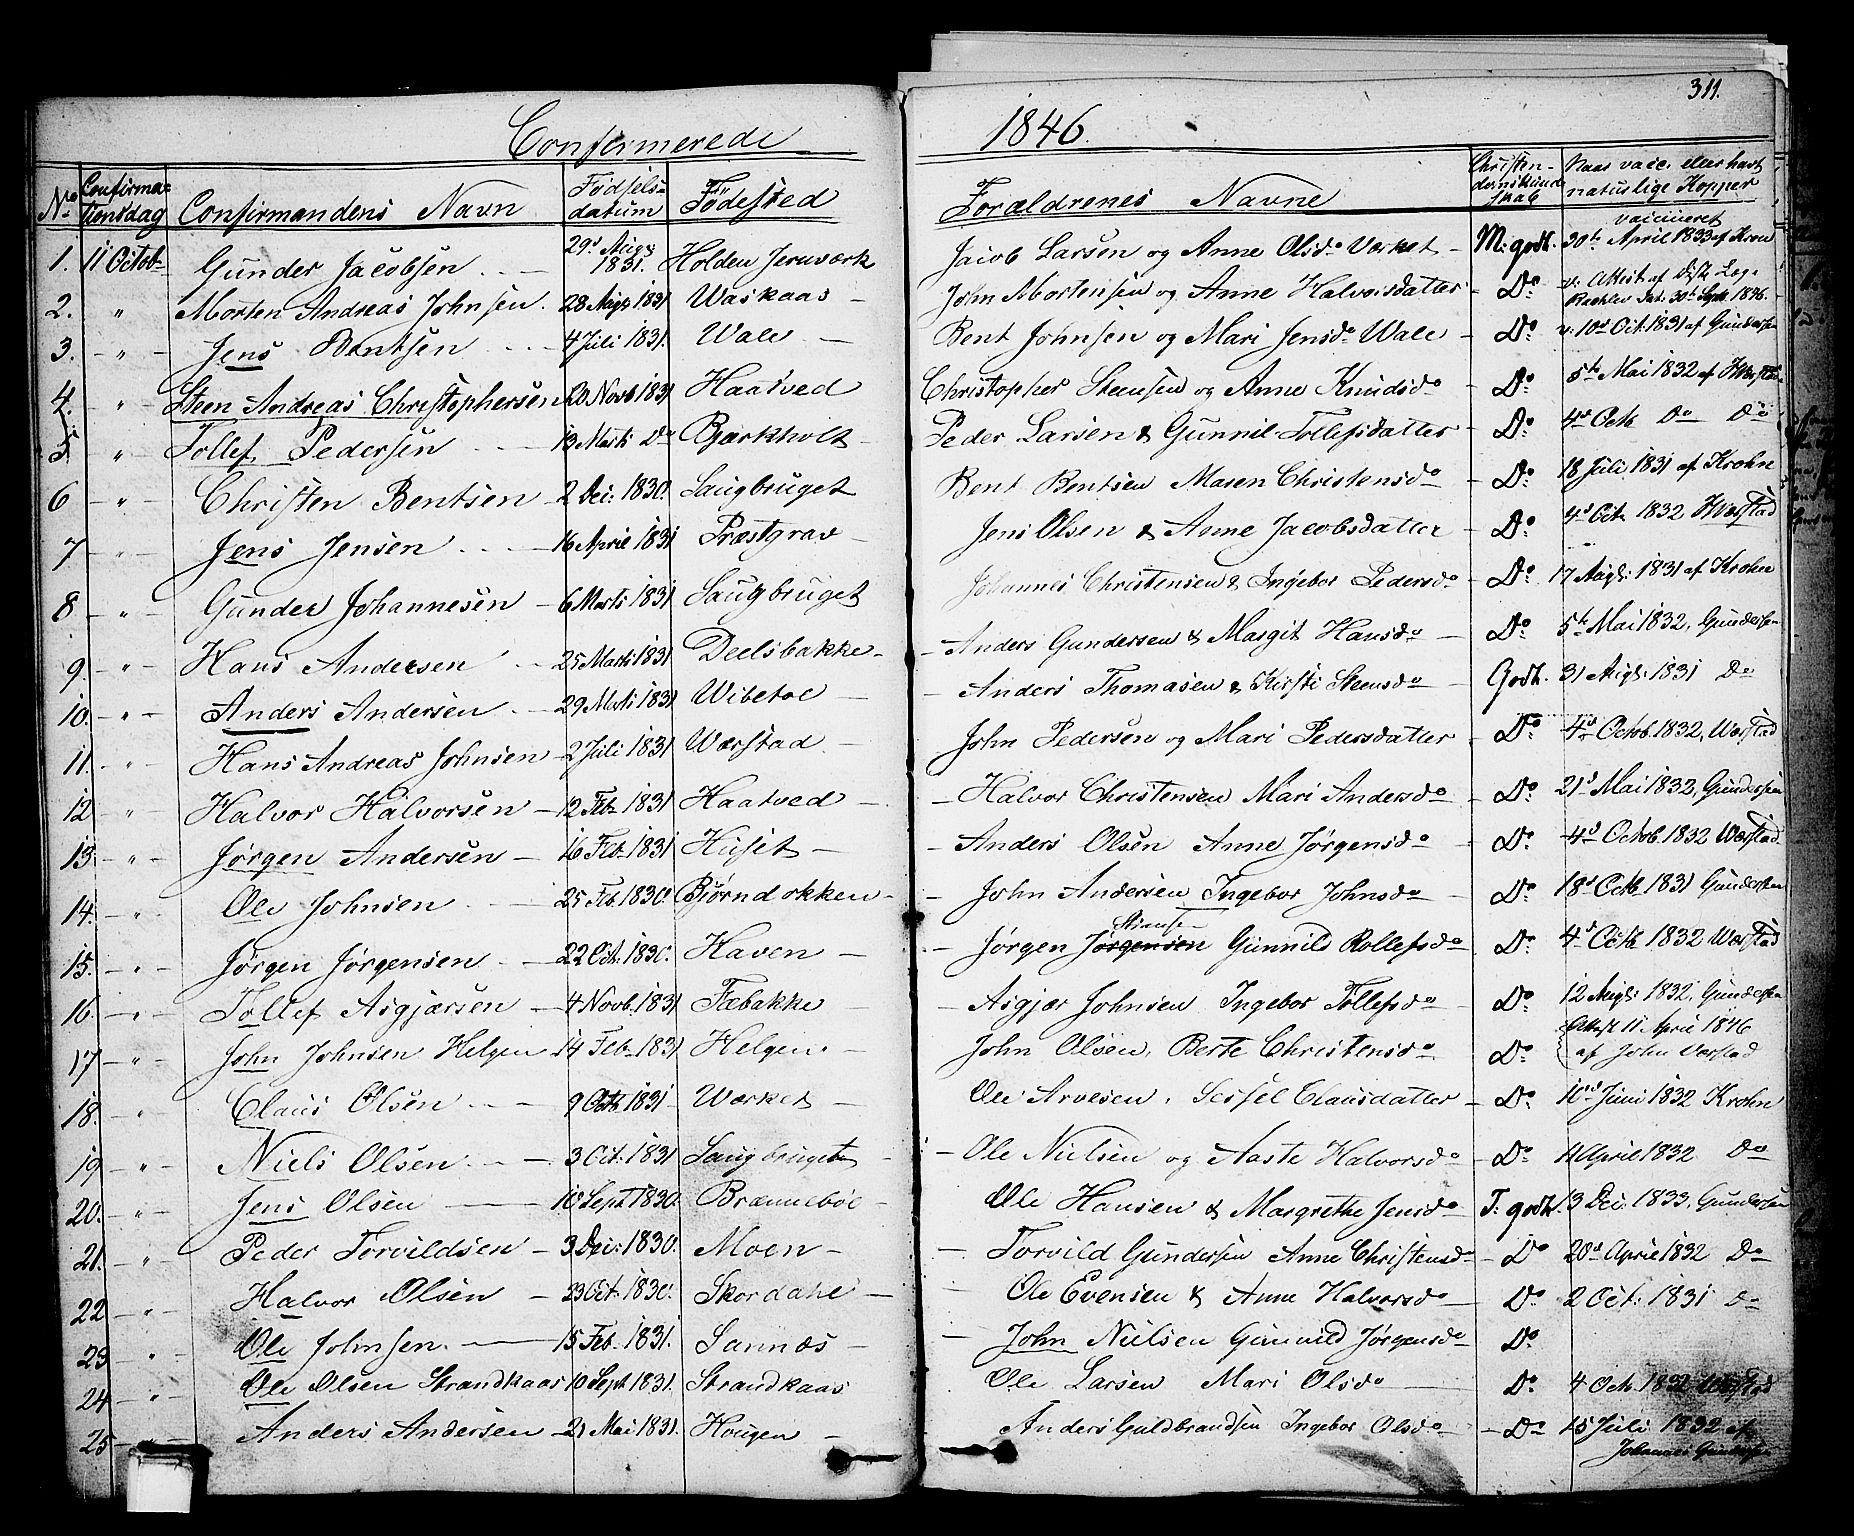 SAKO, Holla kirkebøker, F/Fa/L0004: Ministerialbok nr. 4, 1830-1848, s. 311